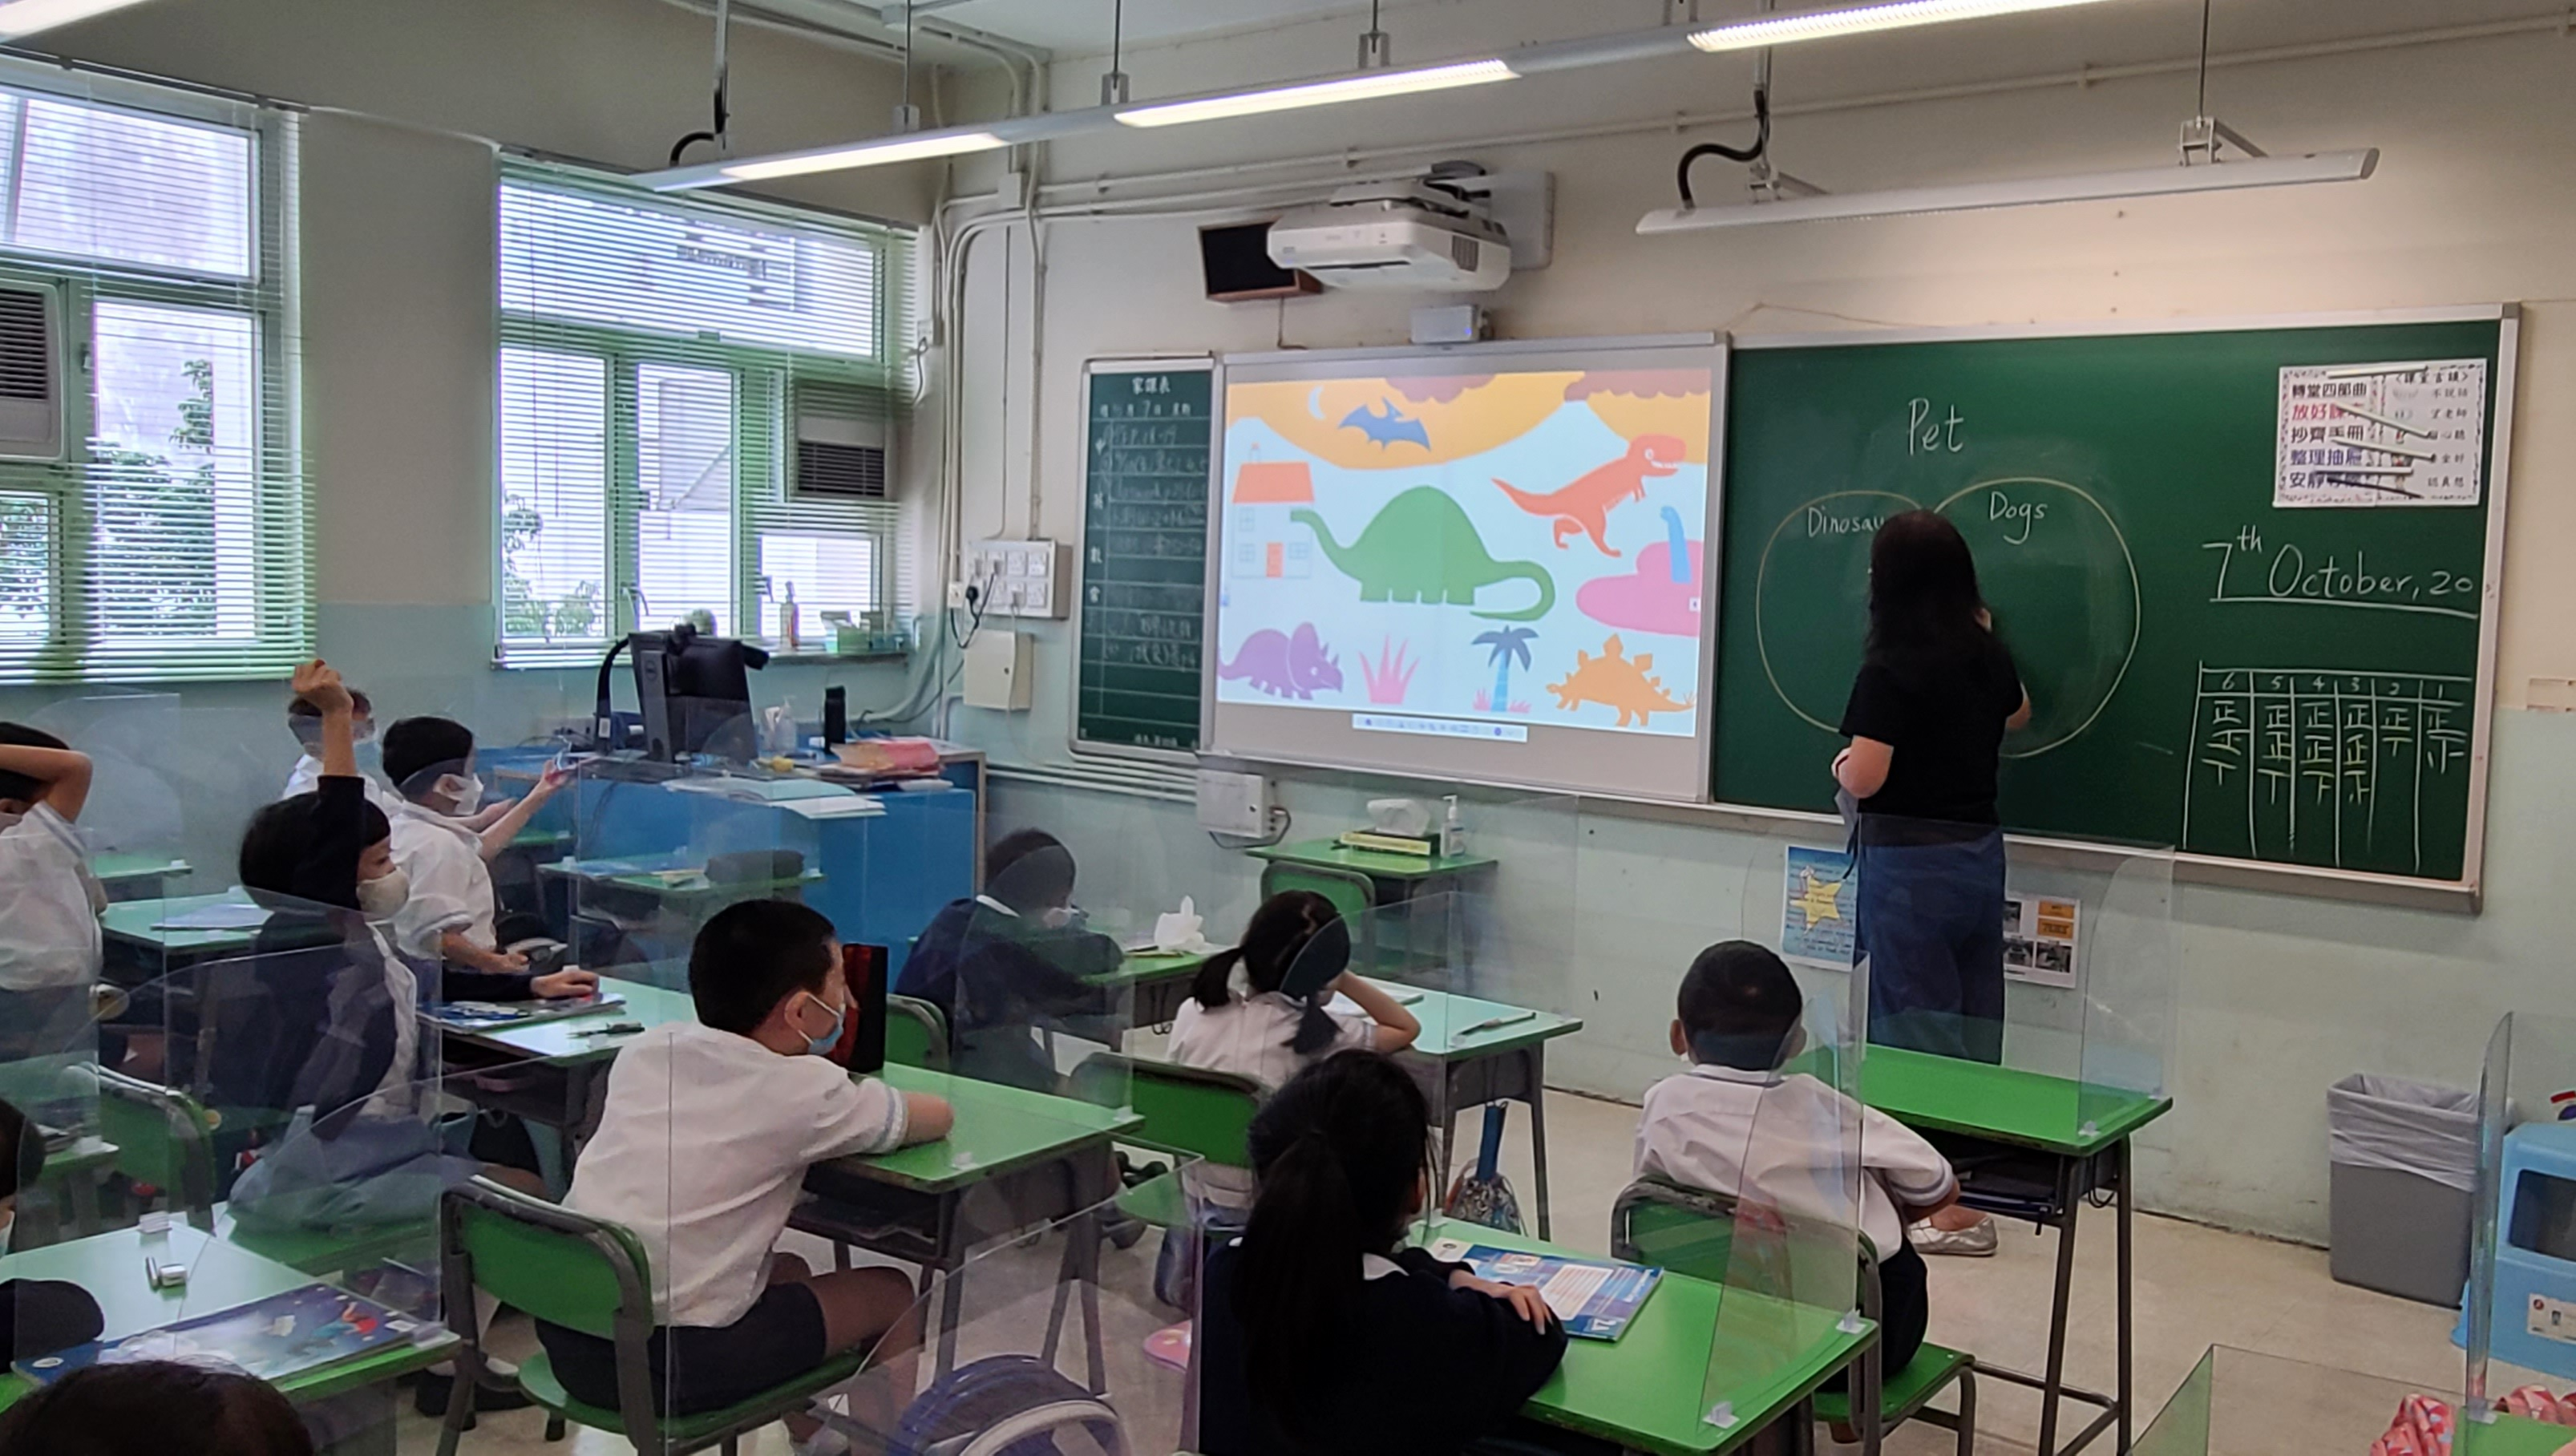 http://keito.school.hk/sites/default/files/20201010_225935.jpg